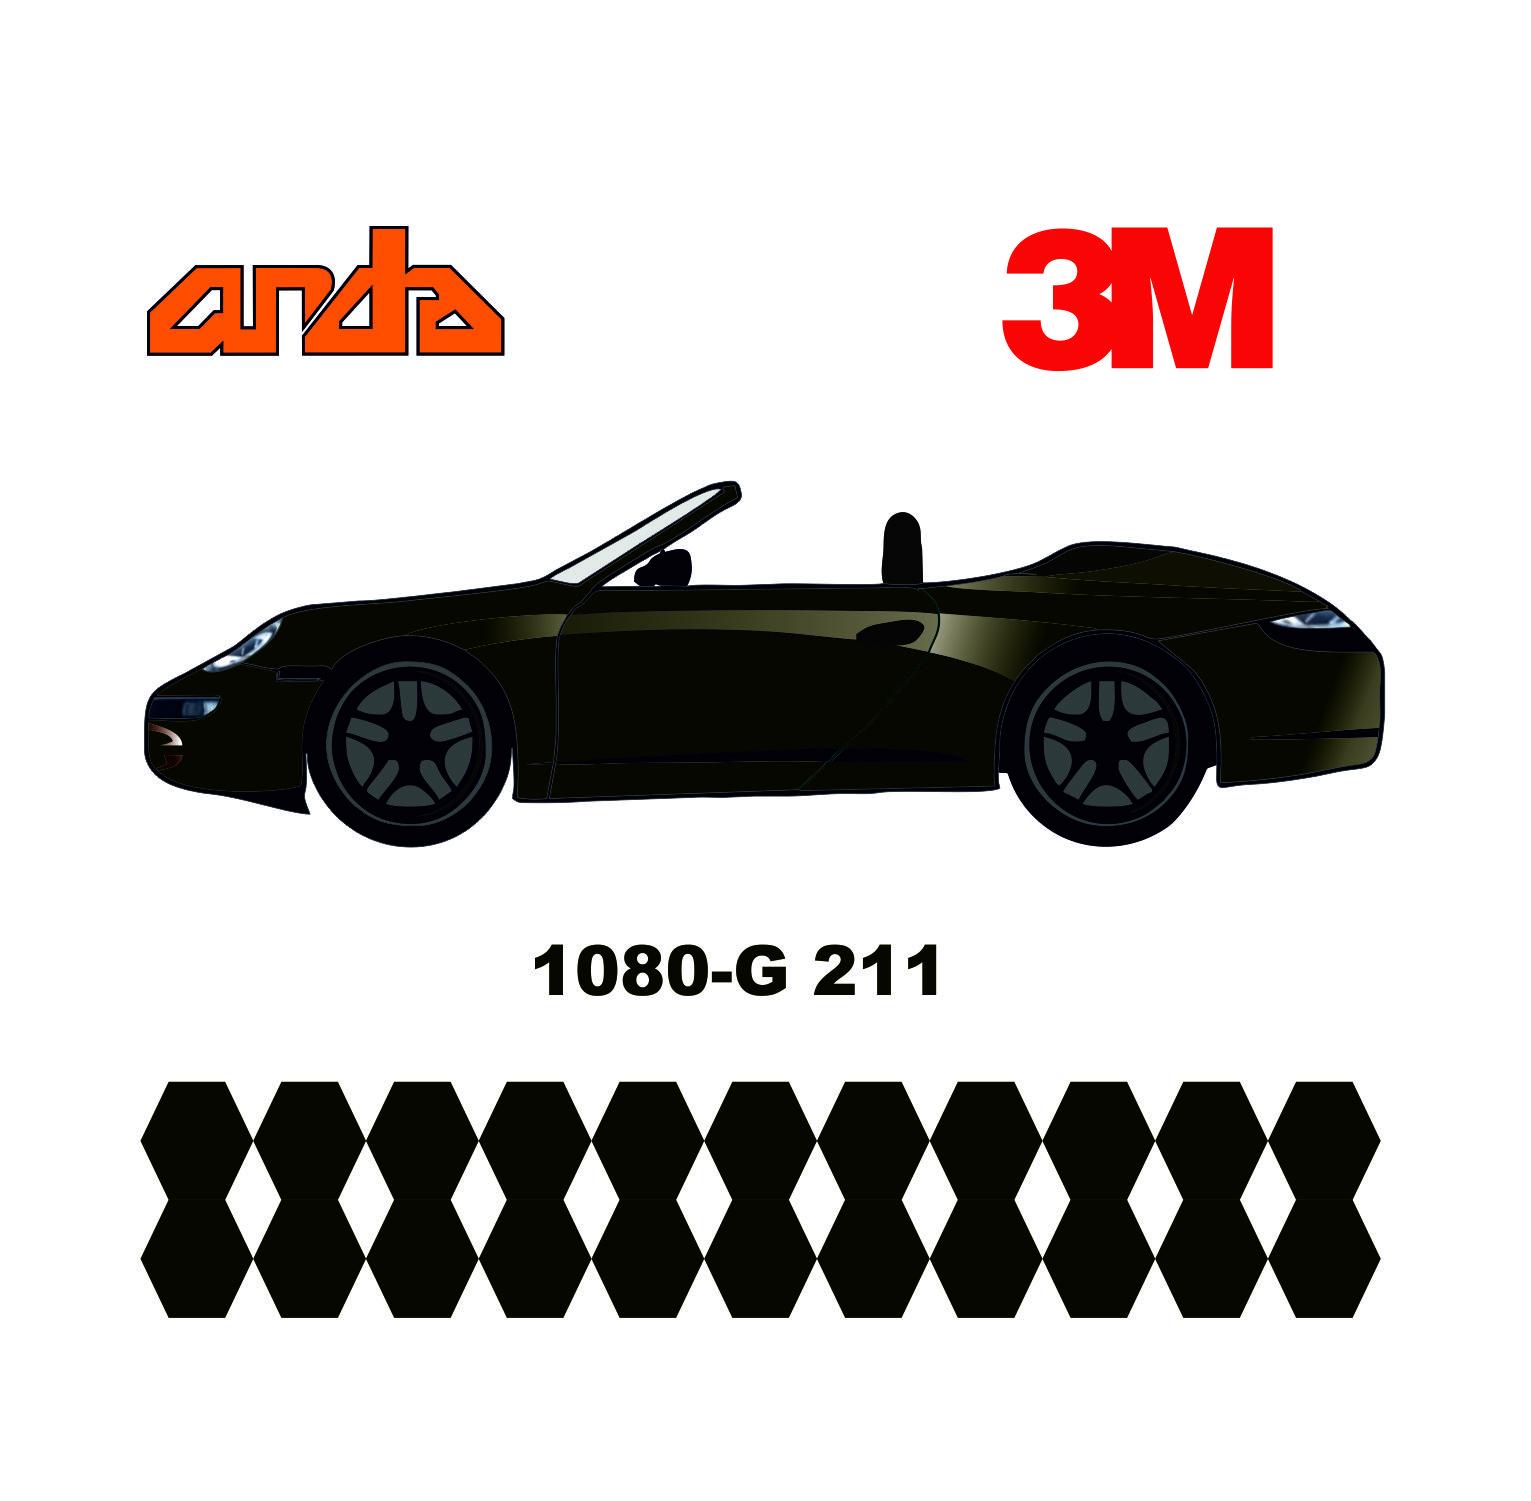 3M 1080-G211 Parlak Metalik Kömür 1